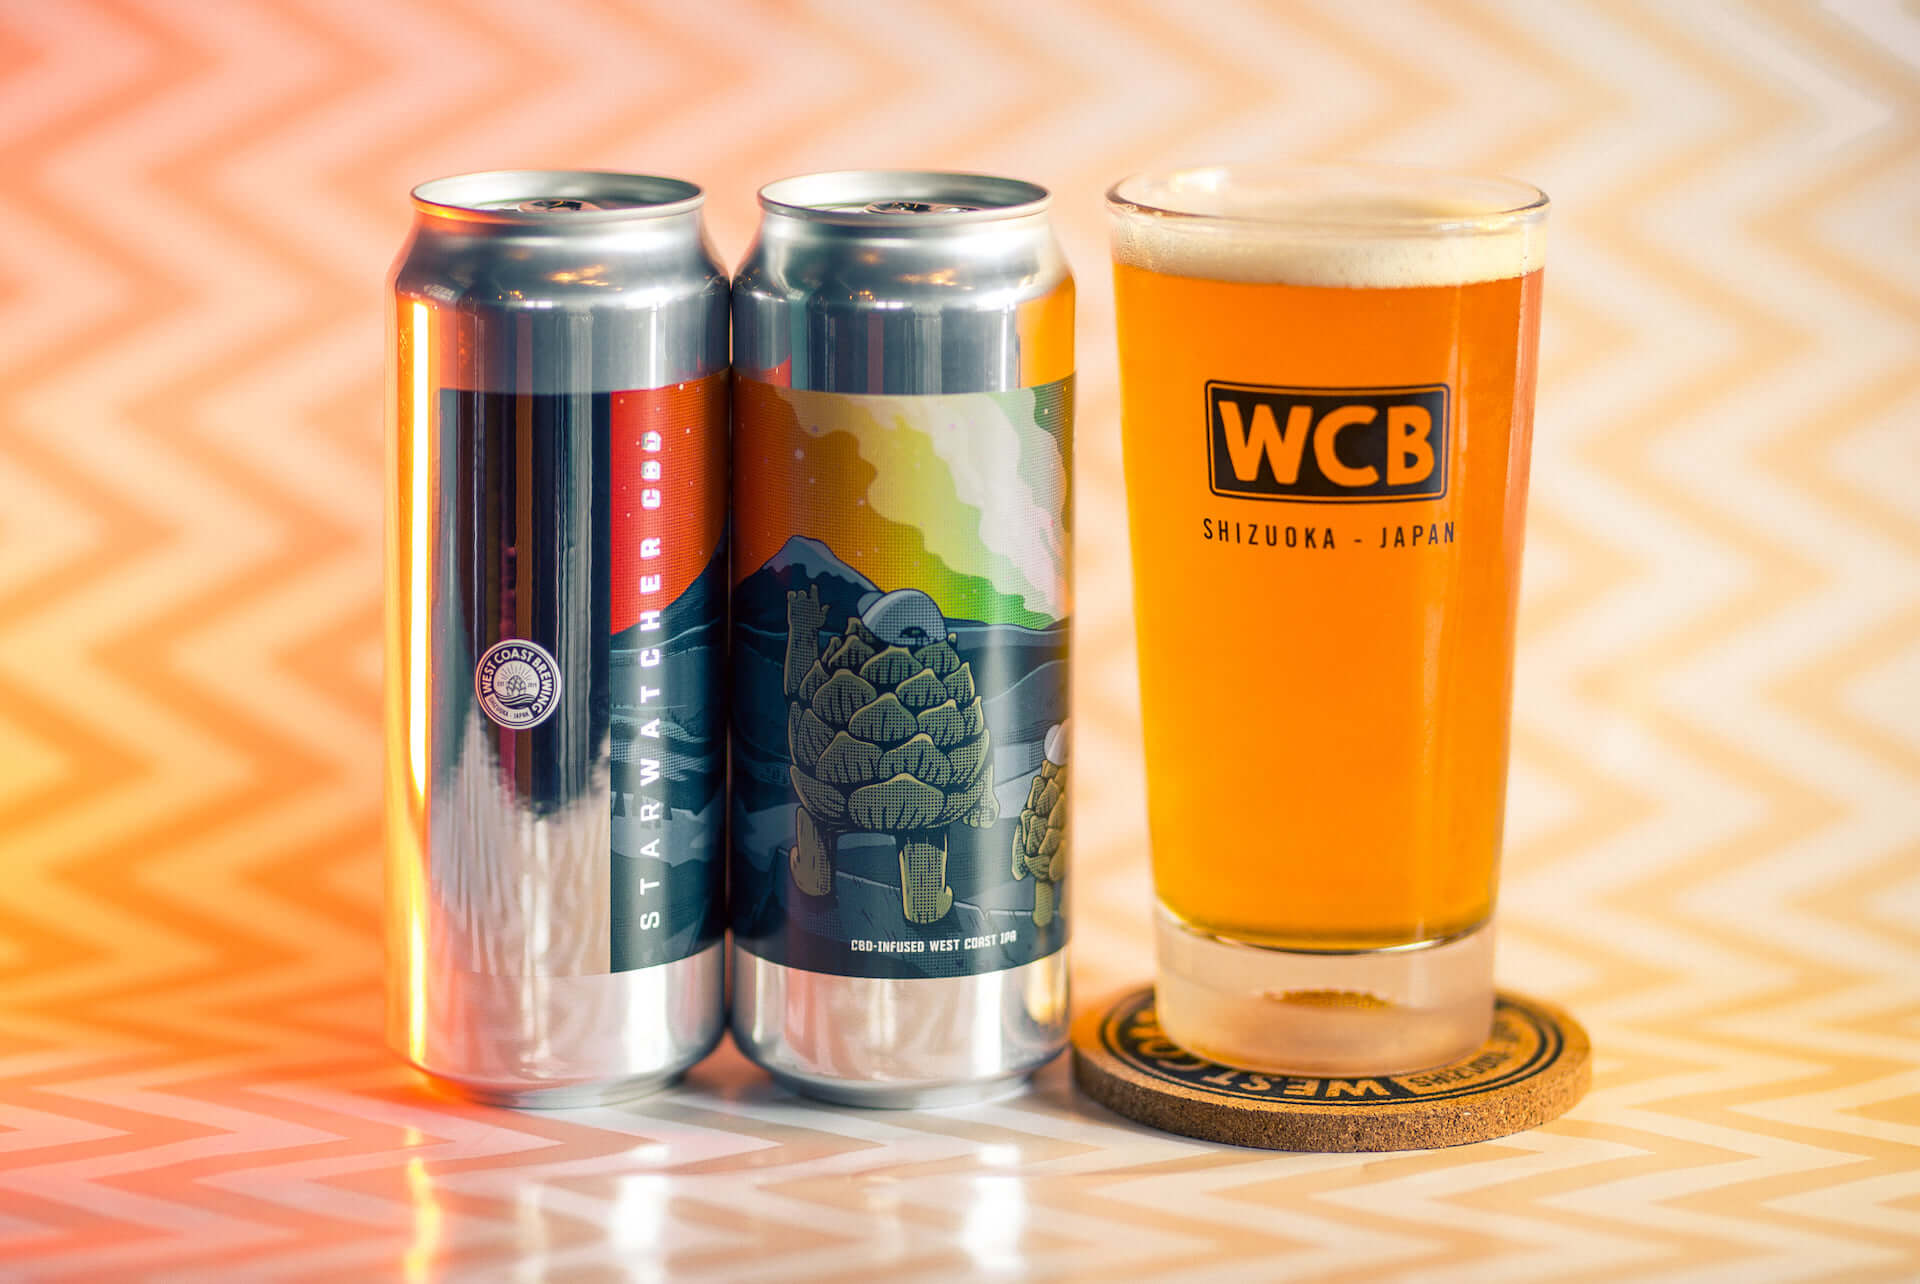 CBD入りクラフトビール『Starwatcher CBD』と『Green Light』がWest Coast Brewingより発売!香り豊かなIPAを採用 gourmet210302_westcoastbrewing_1-1920x1284